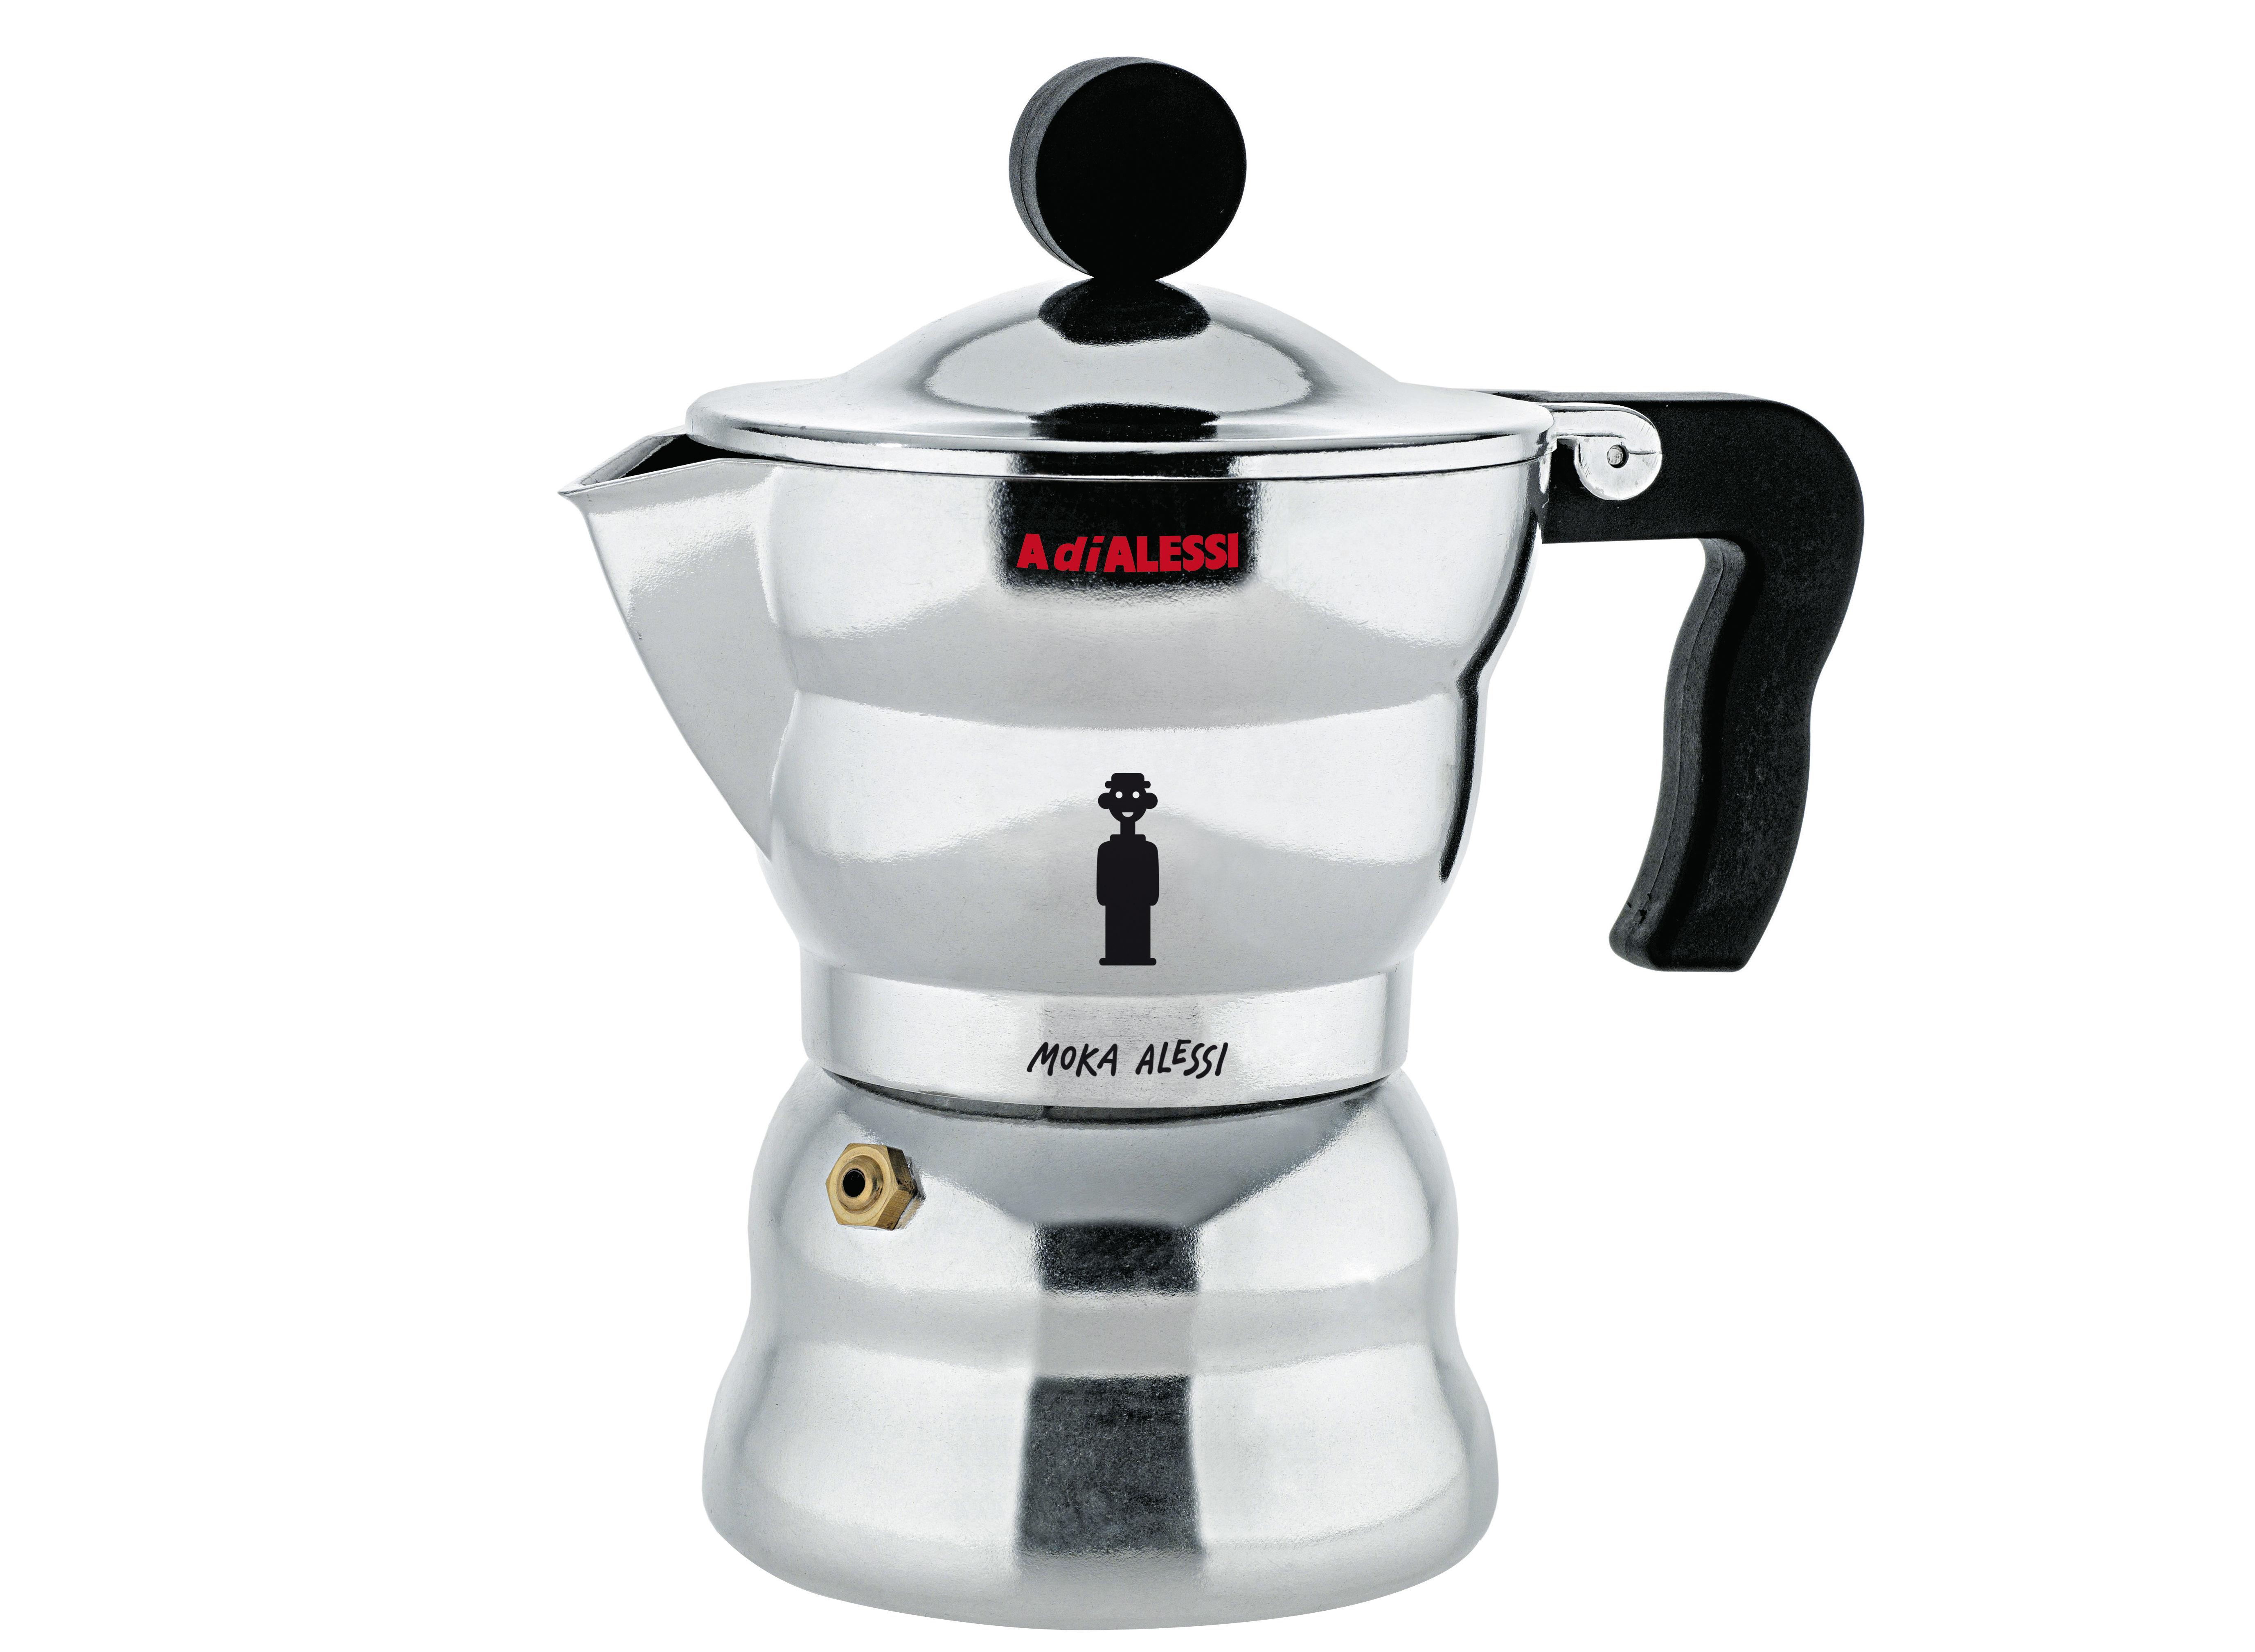 Tableware - Tea & Coffee Accessories - Moka Italian espresso maker - 3 cups by A di Alessi - Polished aluminium - 15 cl - Cast aluminium, Thermoplastic resin